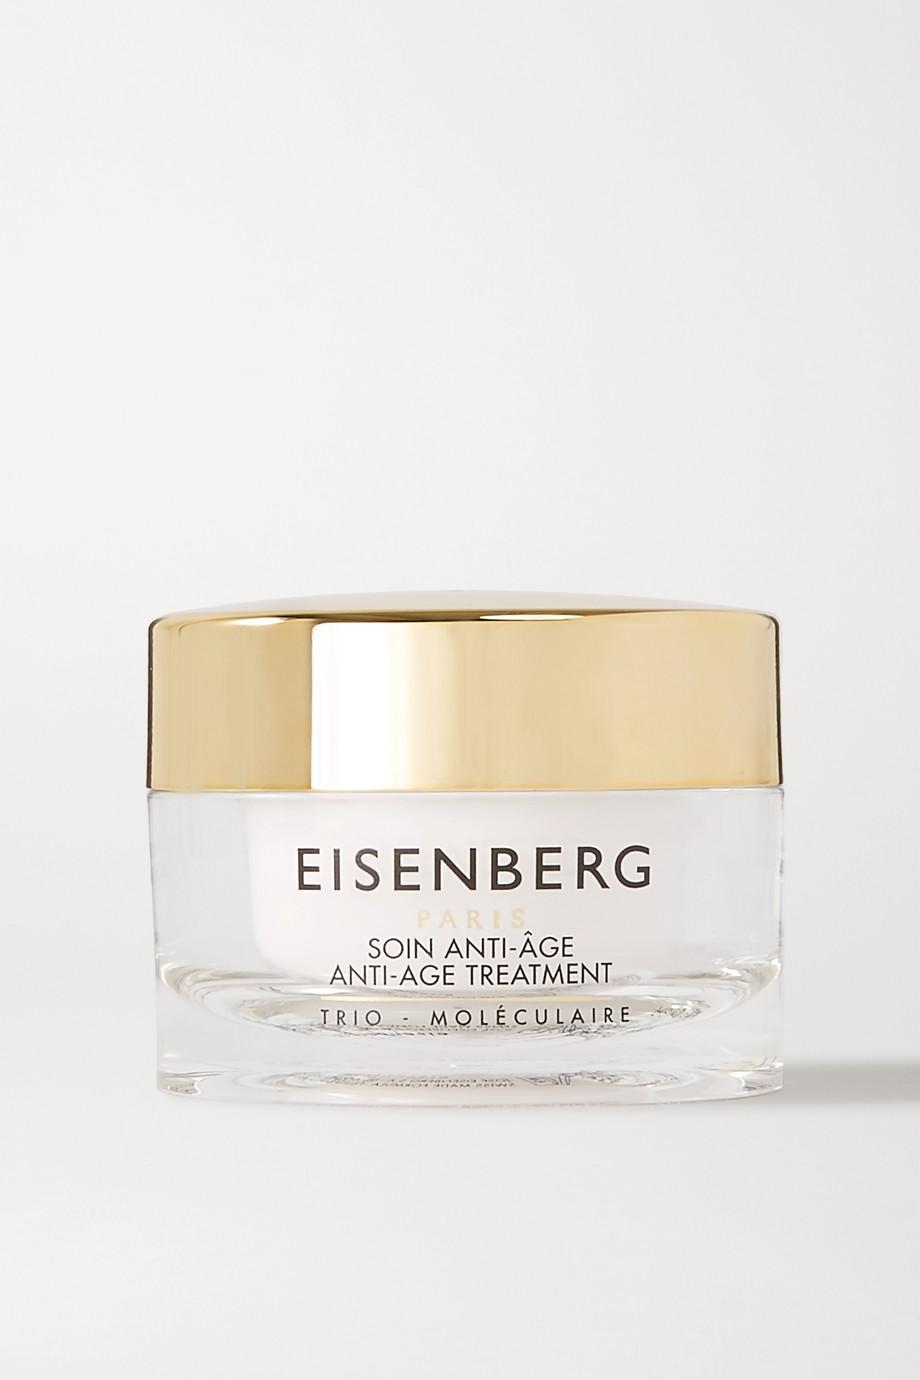 EISENBERG Paris Anti-Age Treatment, 50 ml – Anti-Aging-Creme